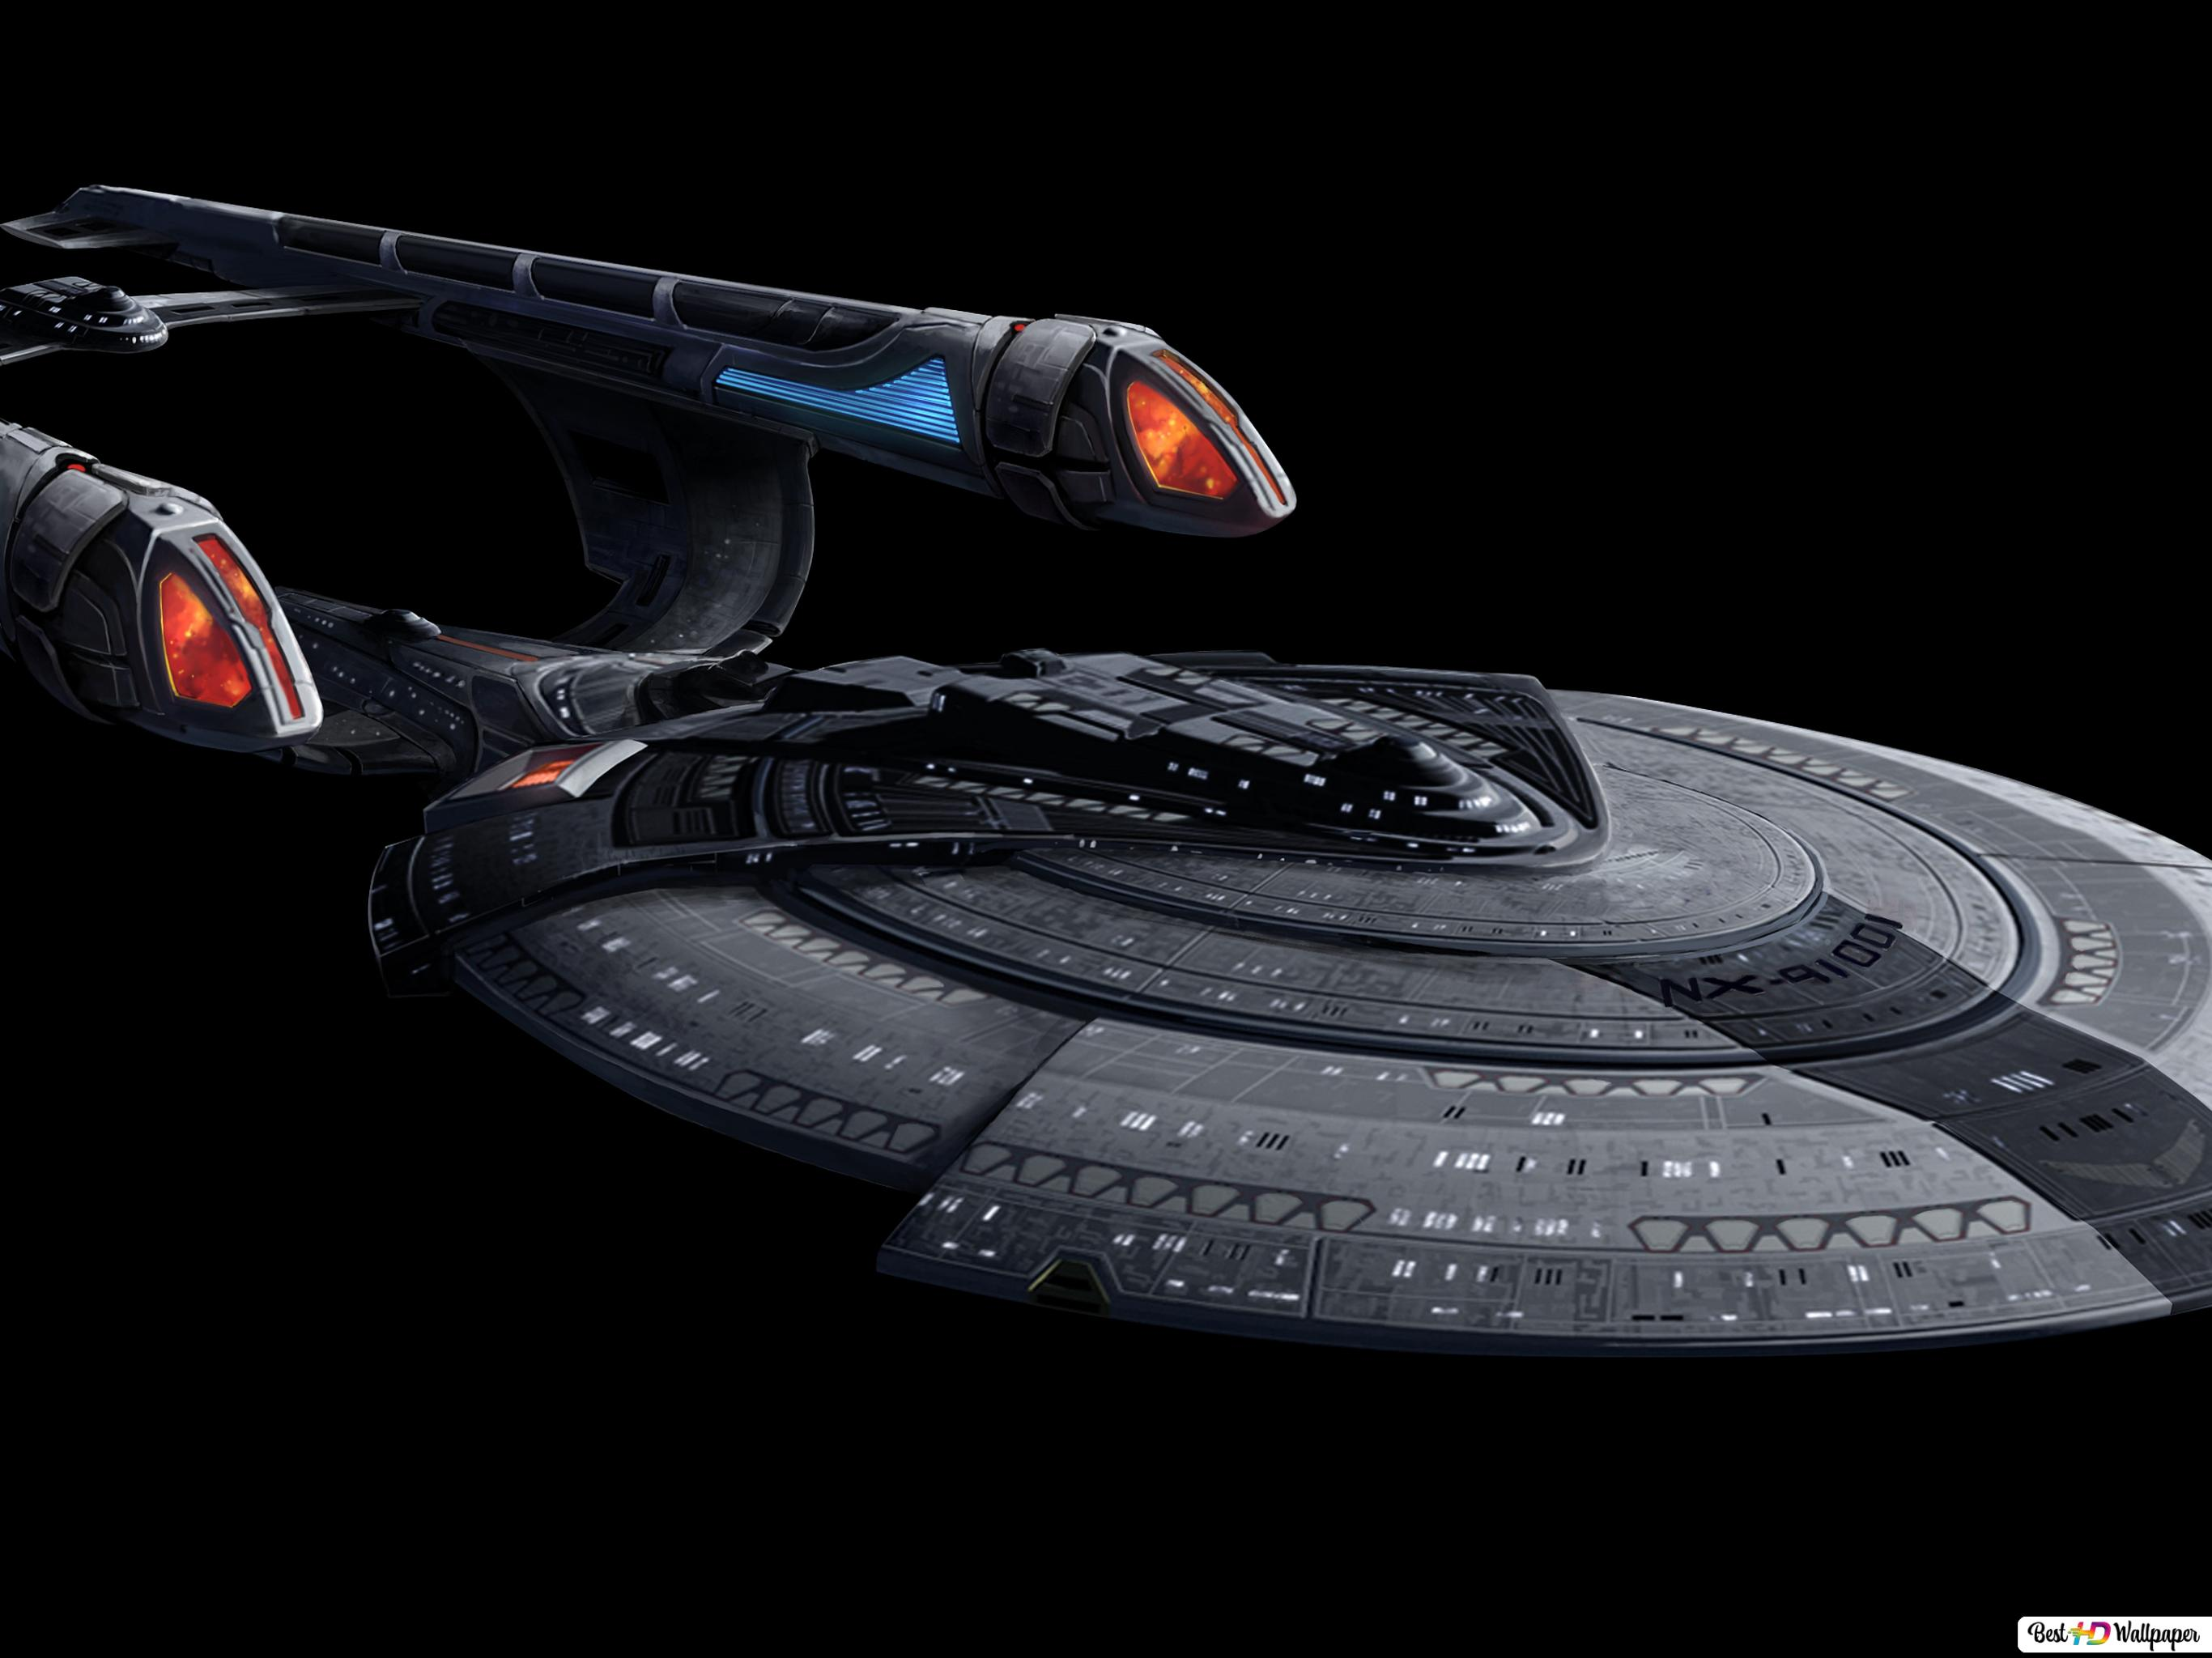 Star Trek Hd Wallpaper Download